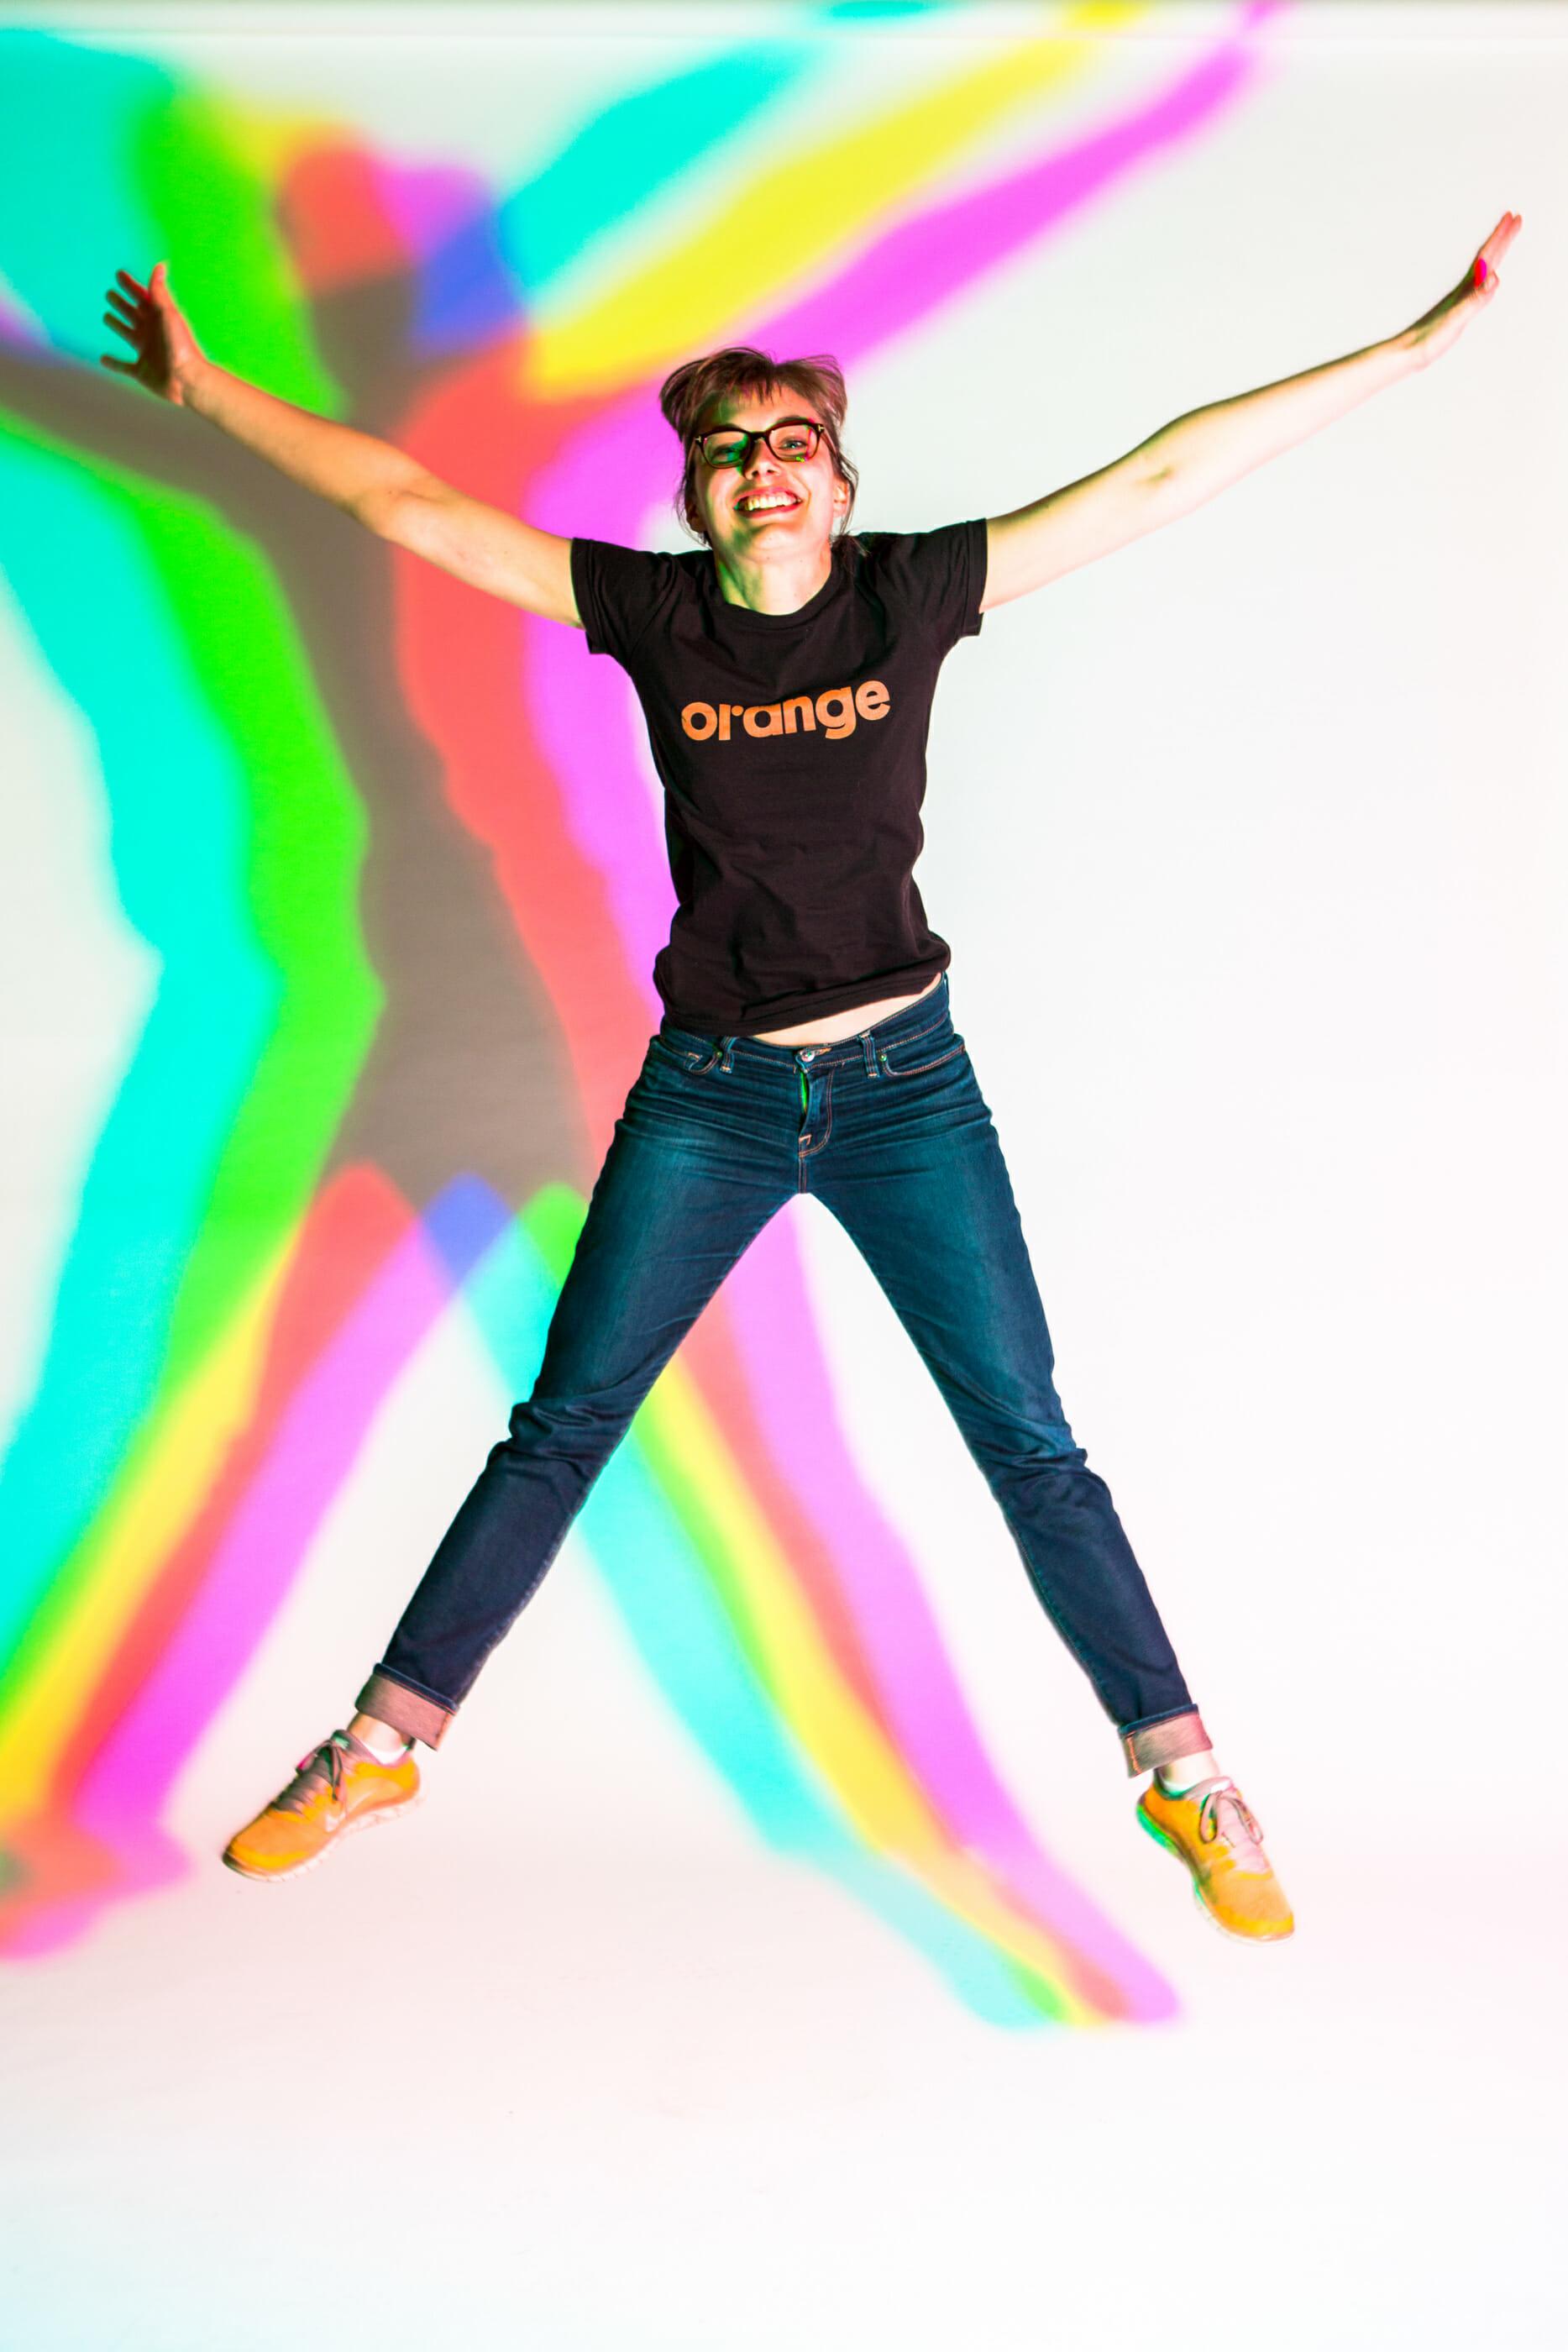 New Rainbow (Unicorn) Shadows Photo Booth!